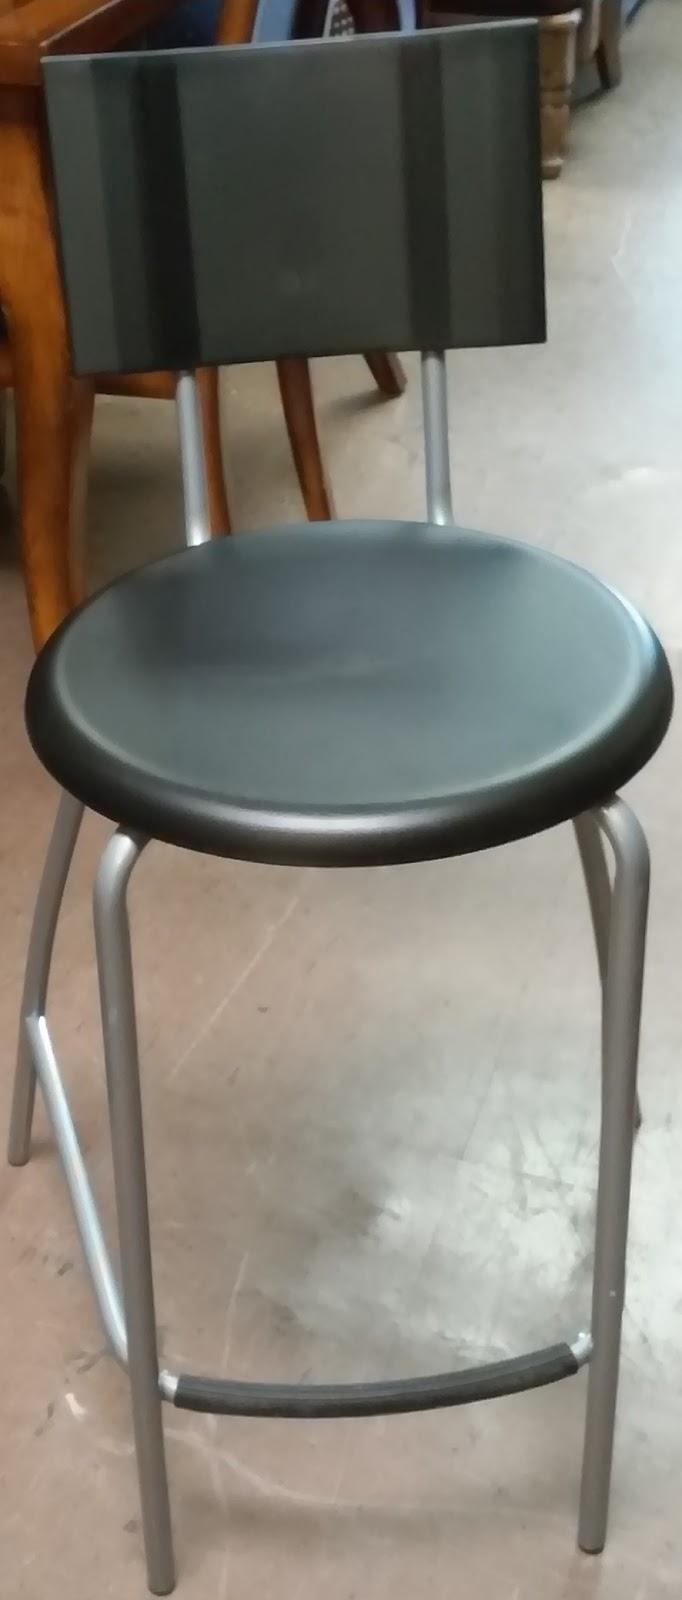 Uhuru furniture collectibles sold 25 tall ikea stool 10 - Tall stool ikea ...